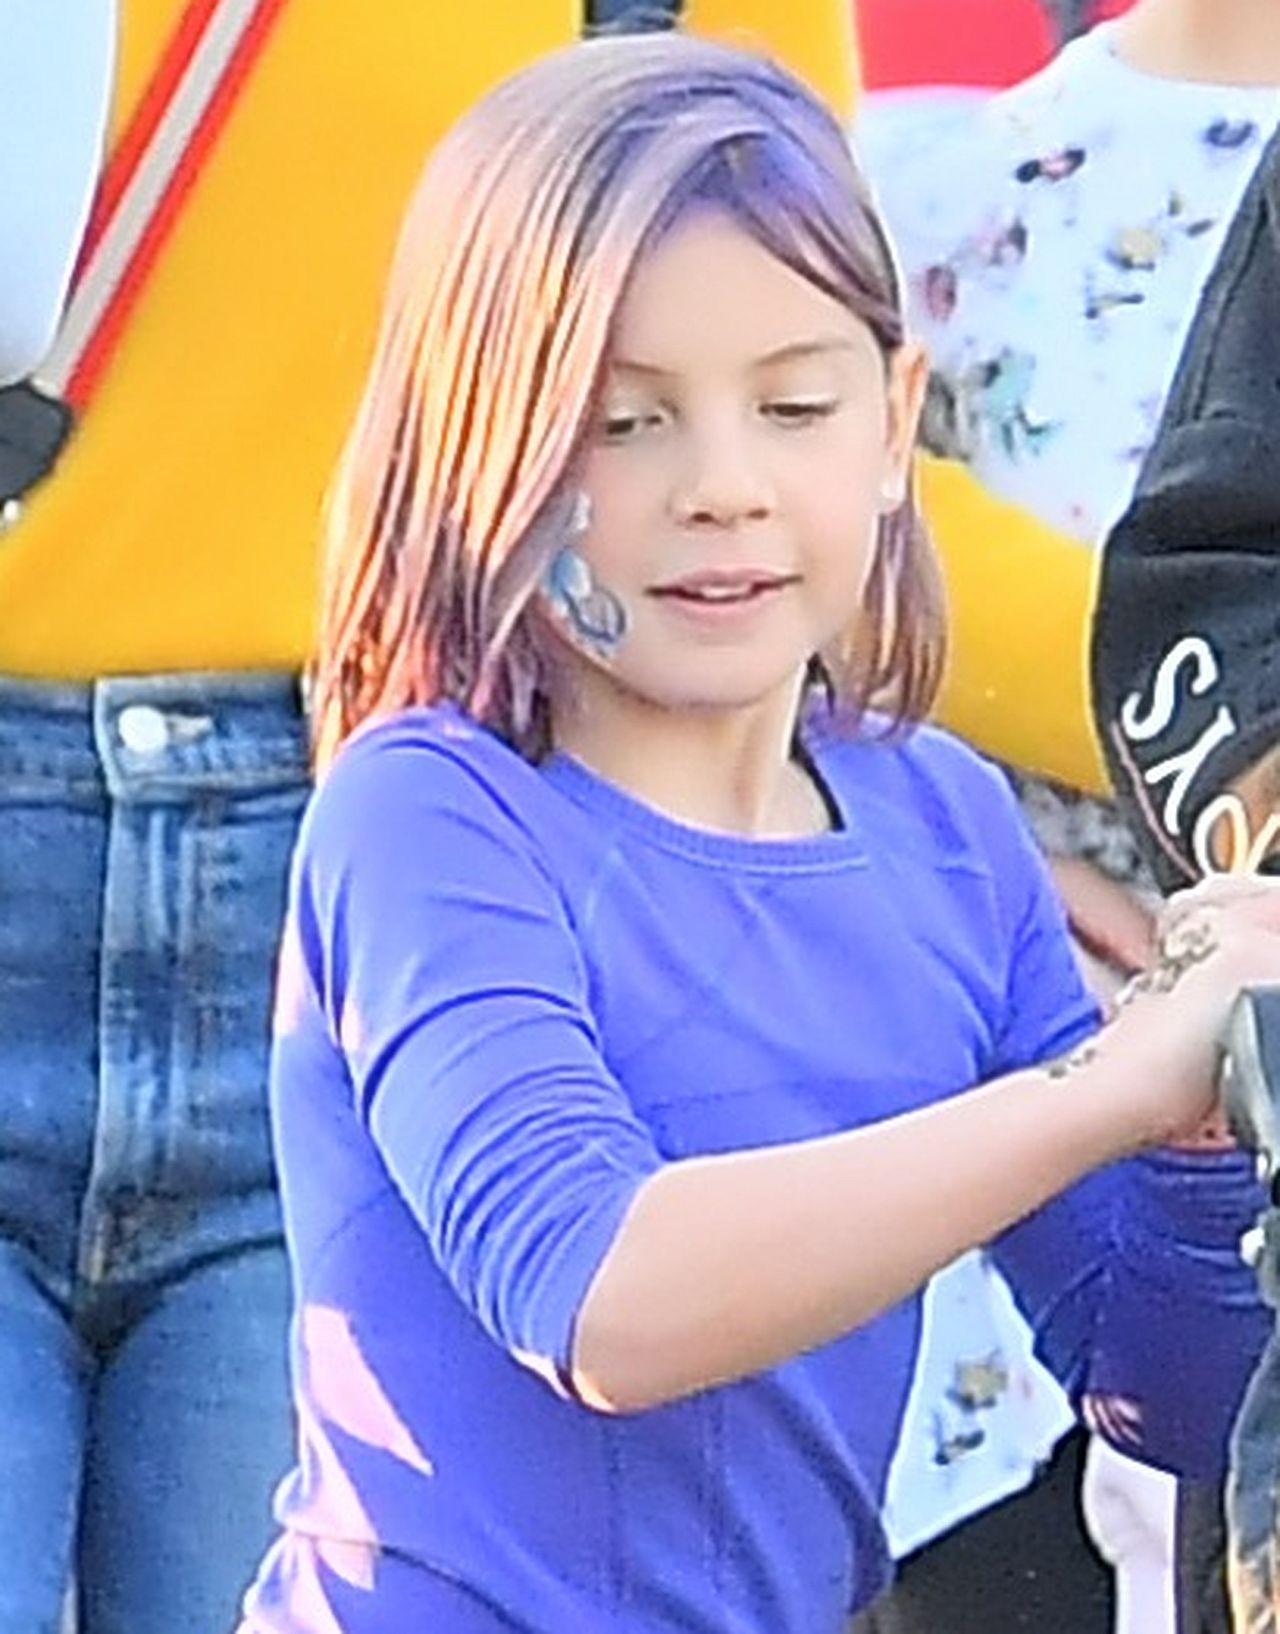 Córka Pink, Willow Hart tak wydoroślała, ma już 8 lat.